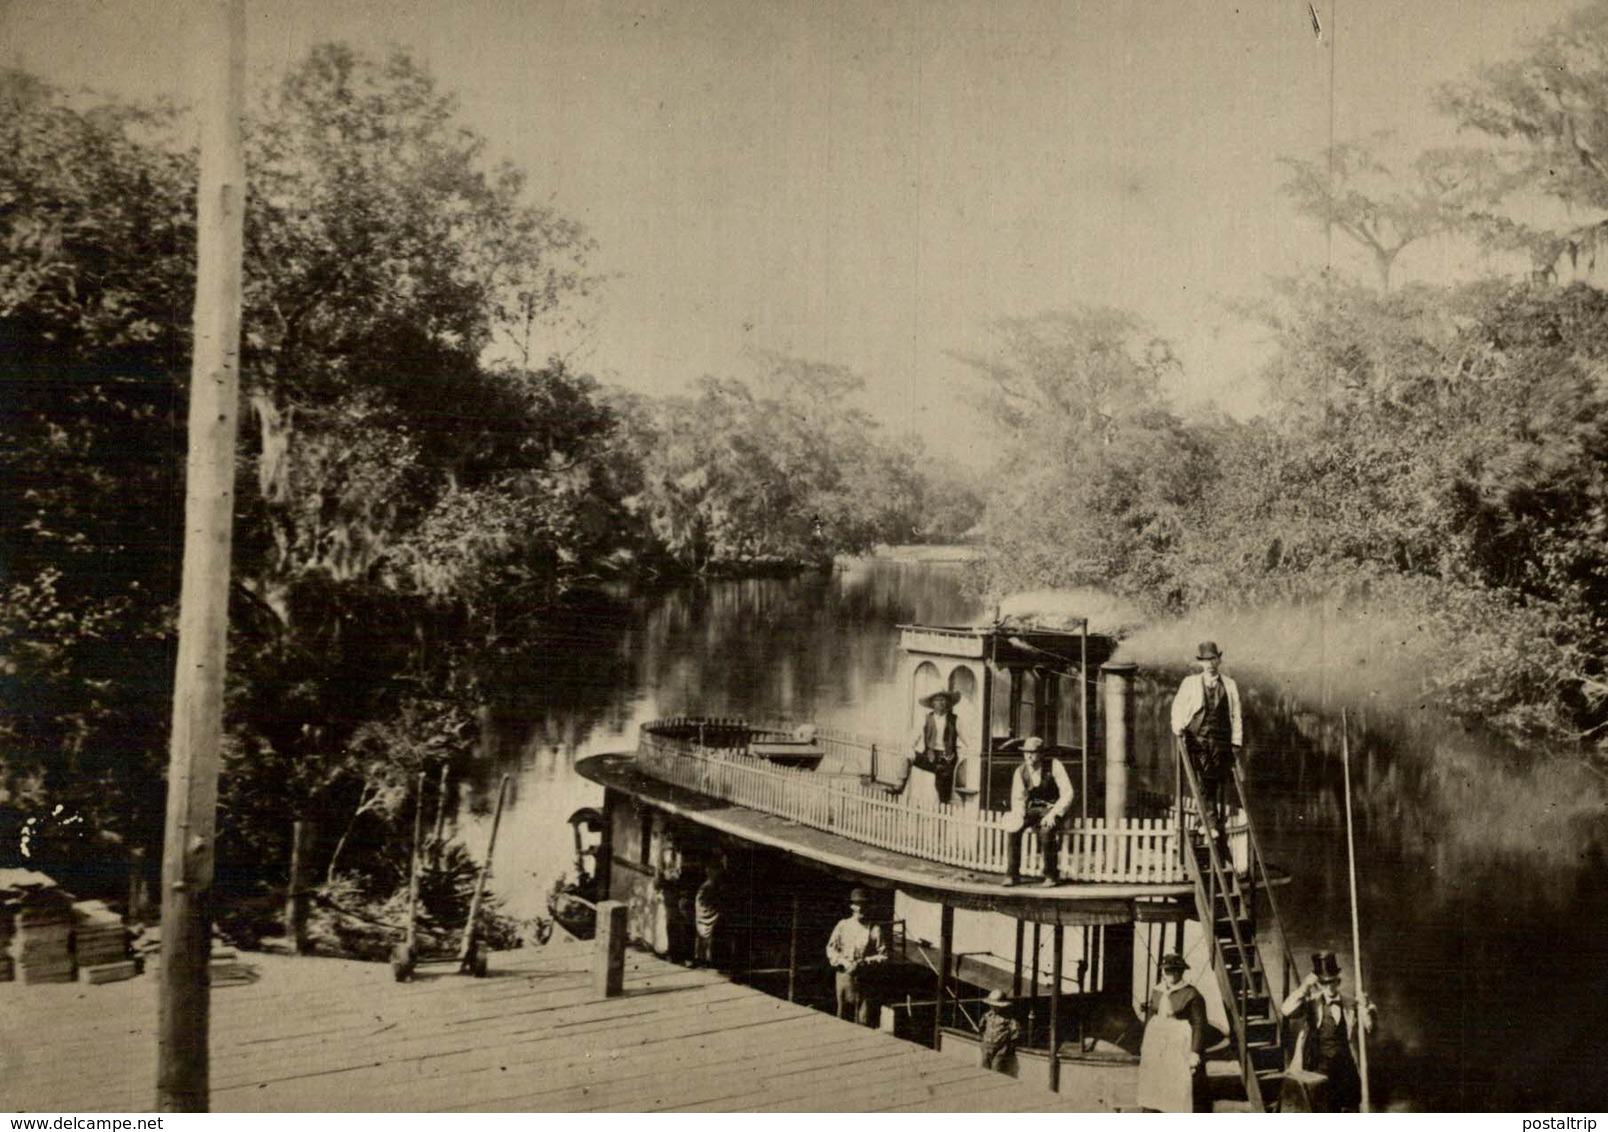 CHASSE AUX ALLIGATORS EN FLORIDA USA DEPART  CROCODILE COCODRILO Krokodil  16*11 CM Fonds Victor FORBIN 1864-1947 - Lugares